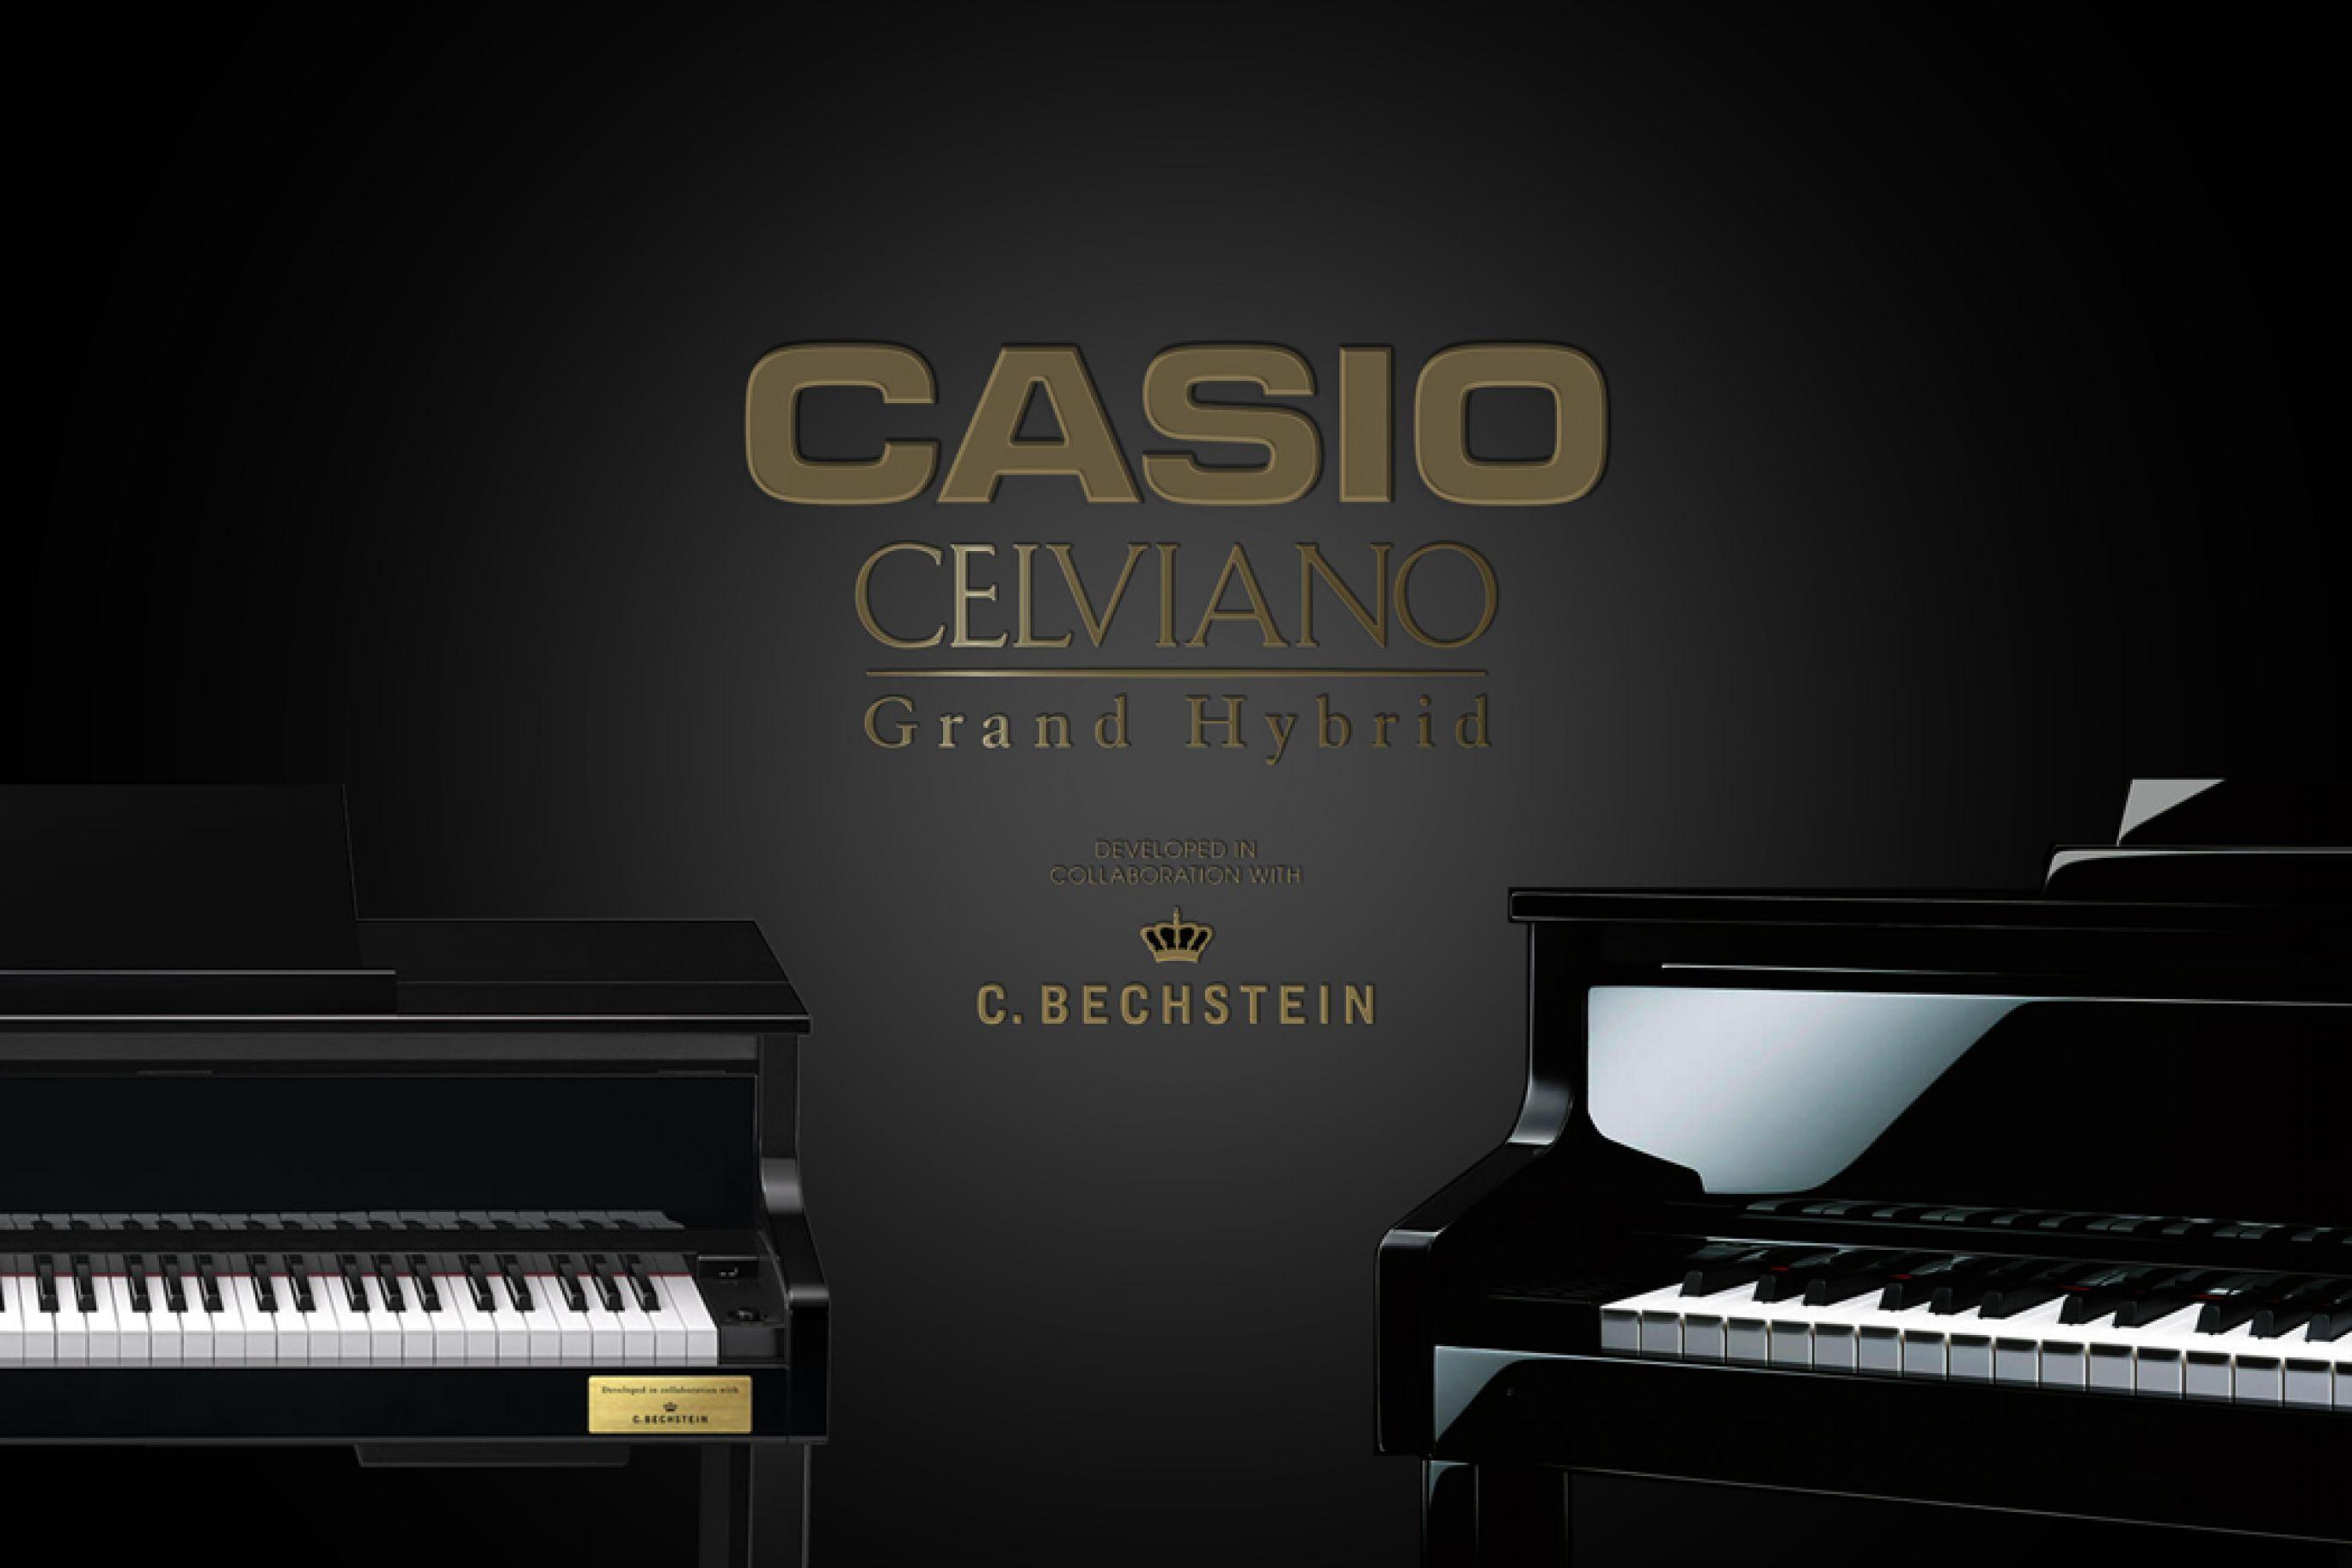 Casio Celviano Grand Hybrid